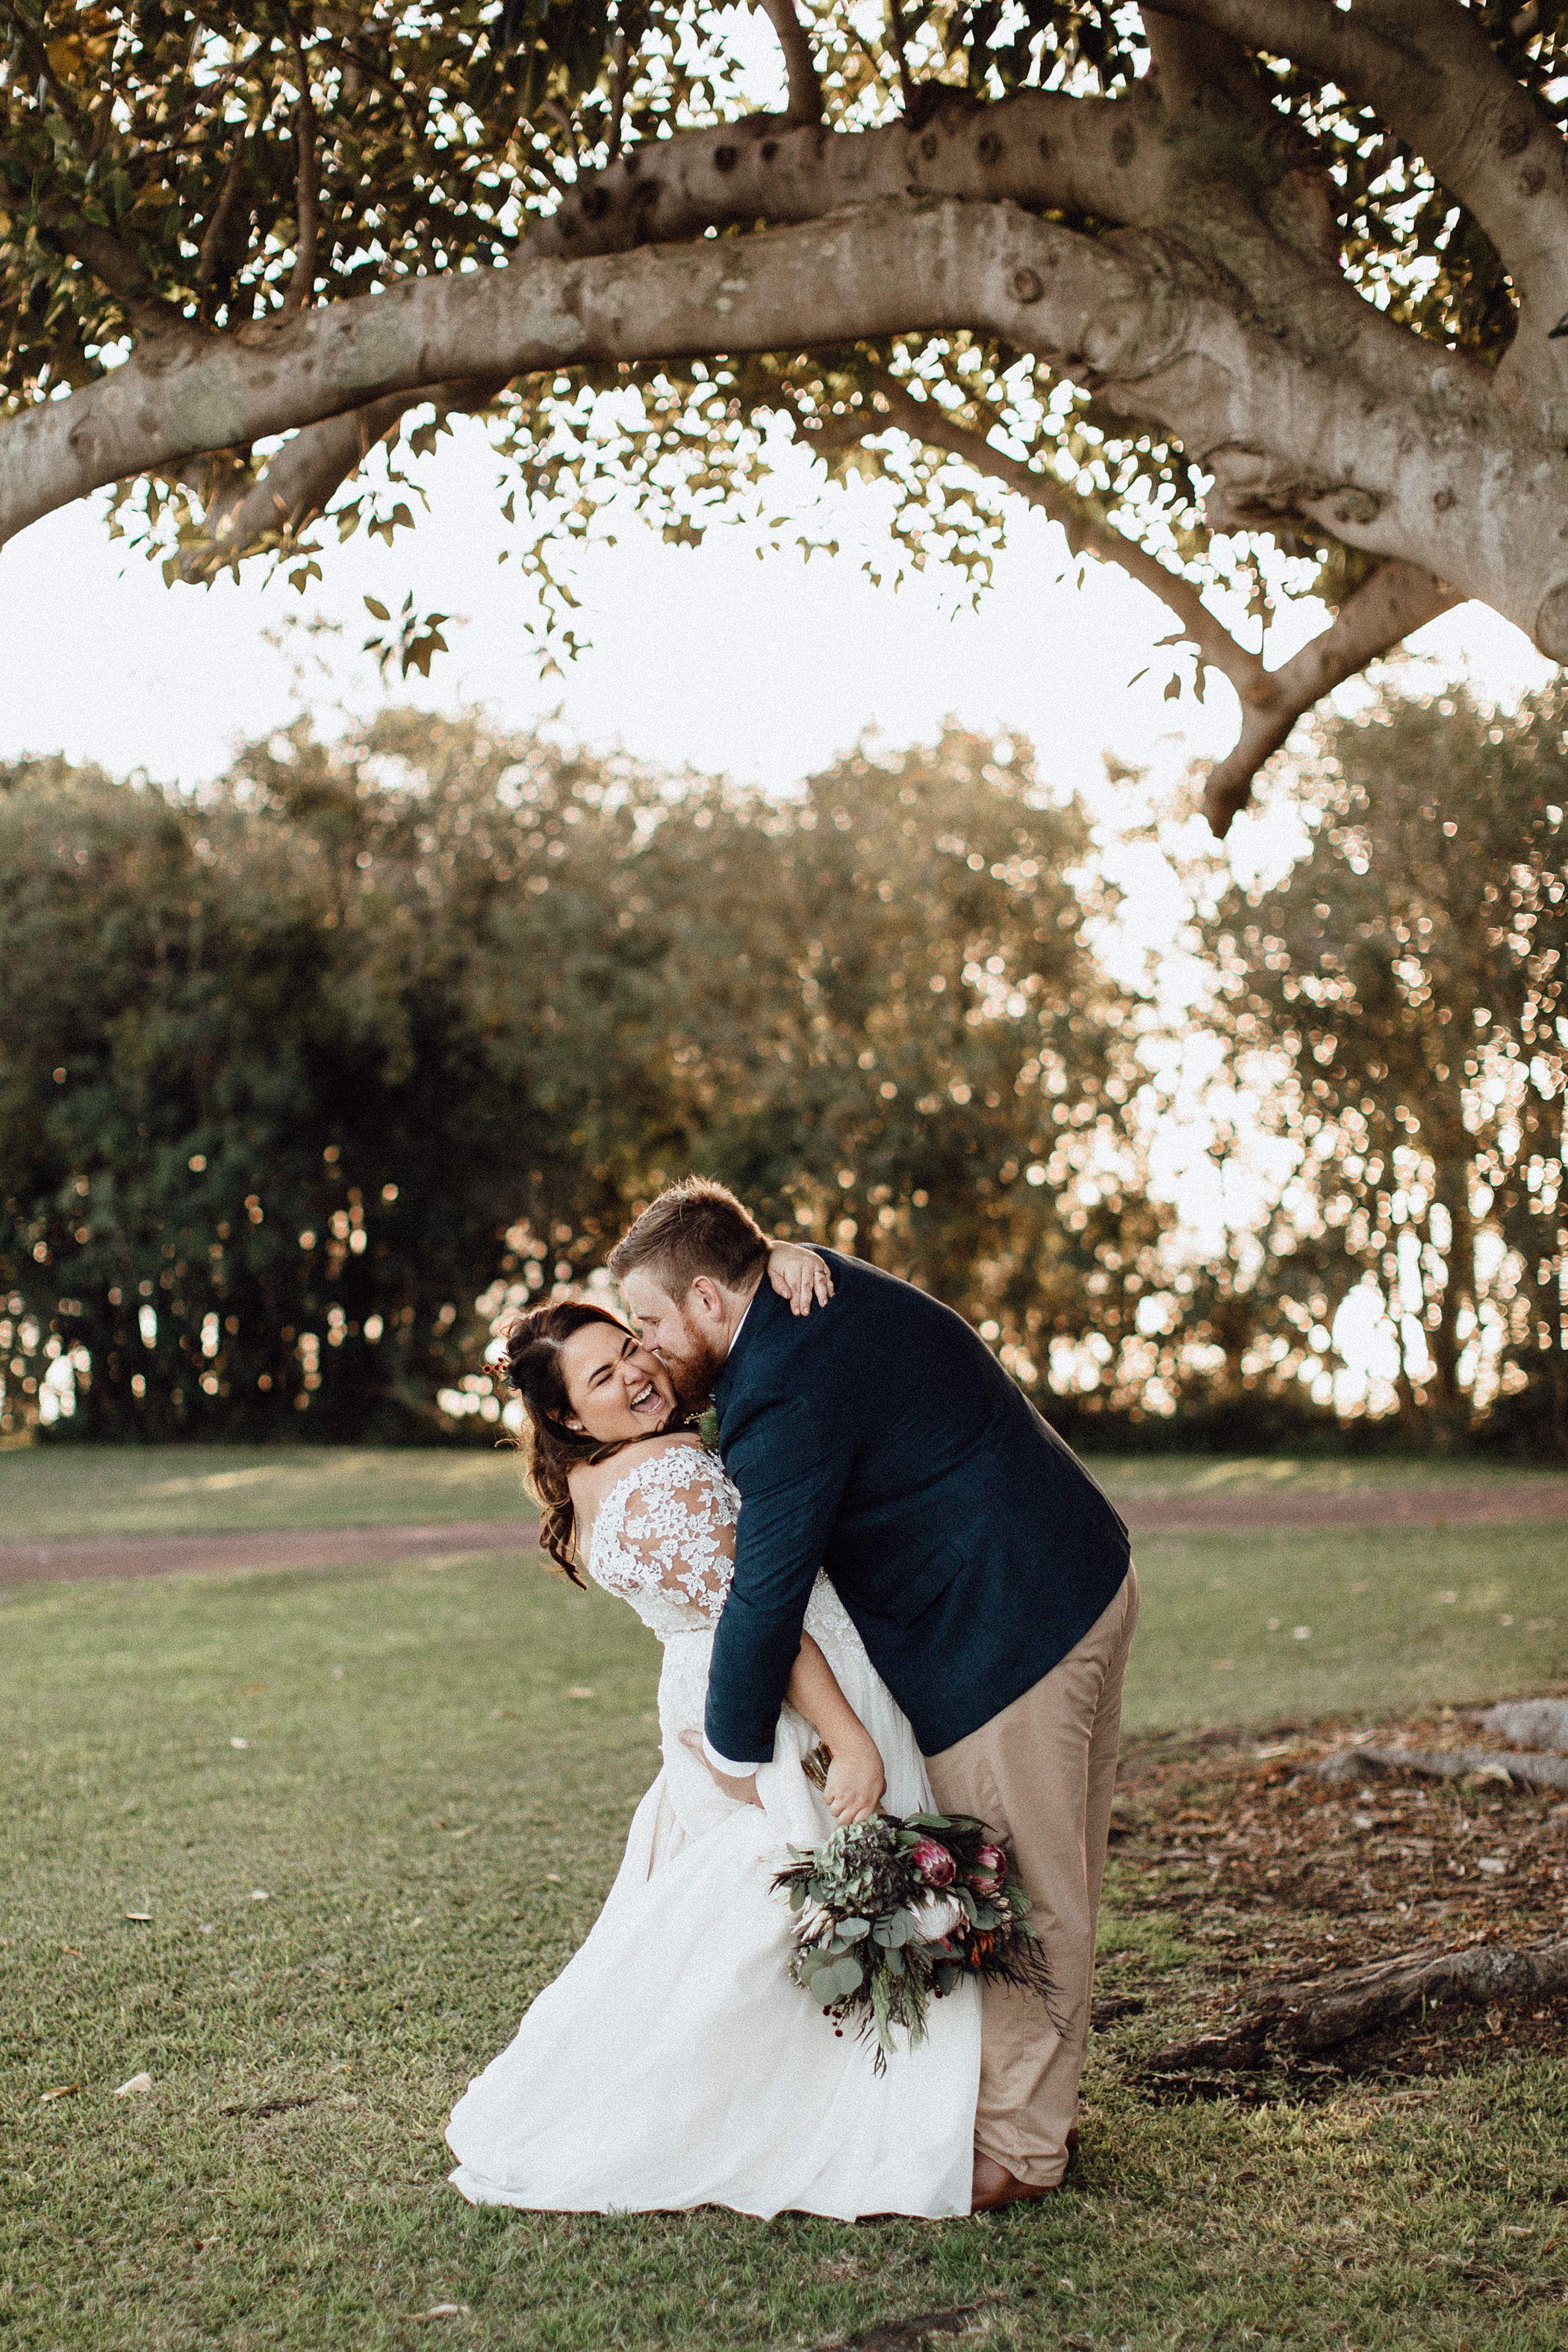 lauren-anne-photography-newcastle-hunter-valley-wedding-photographer_1204.jpg